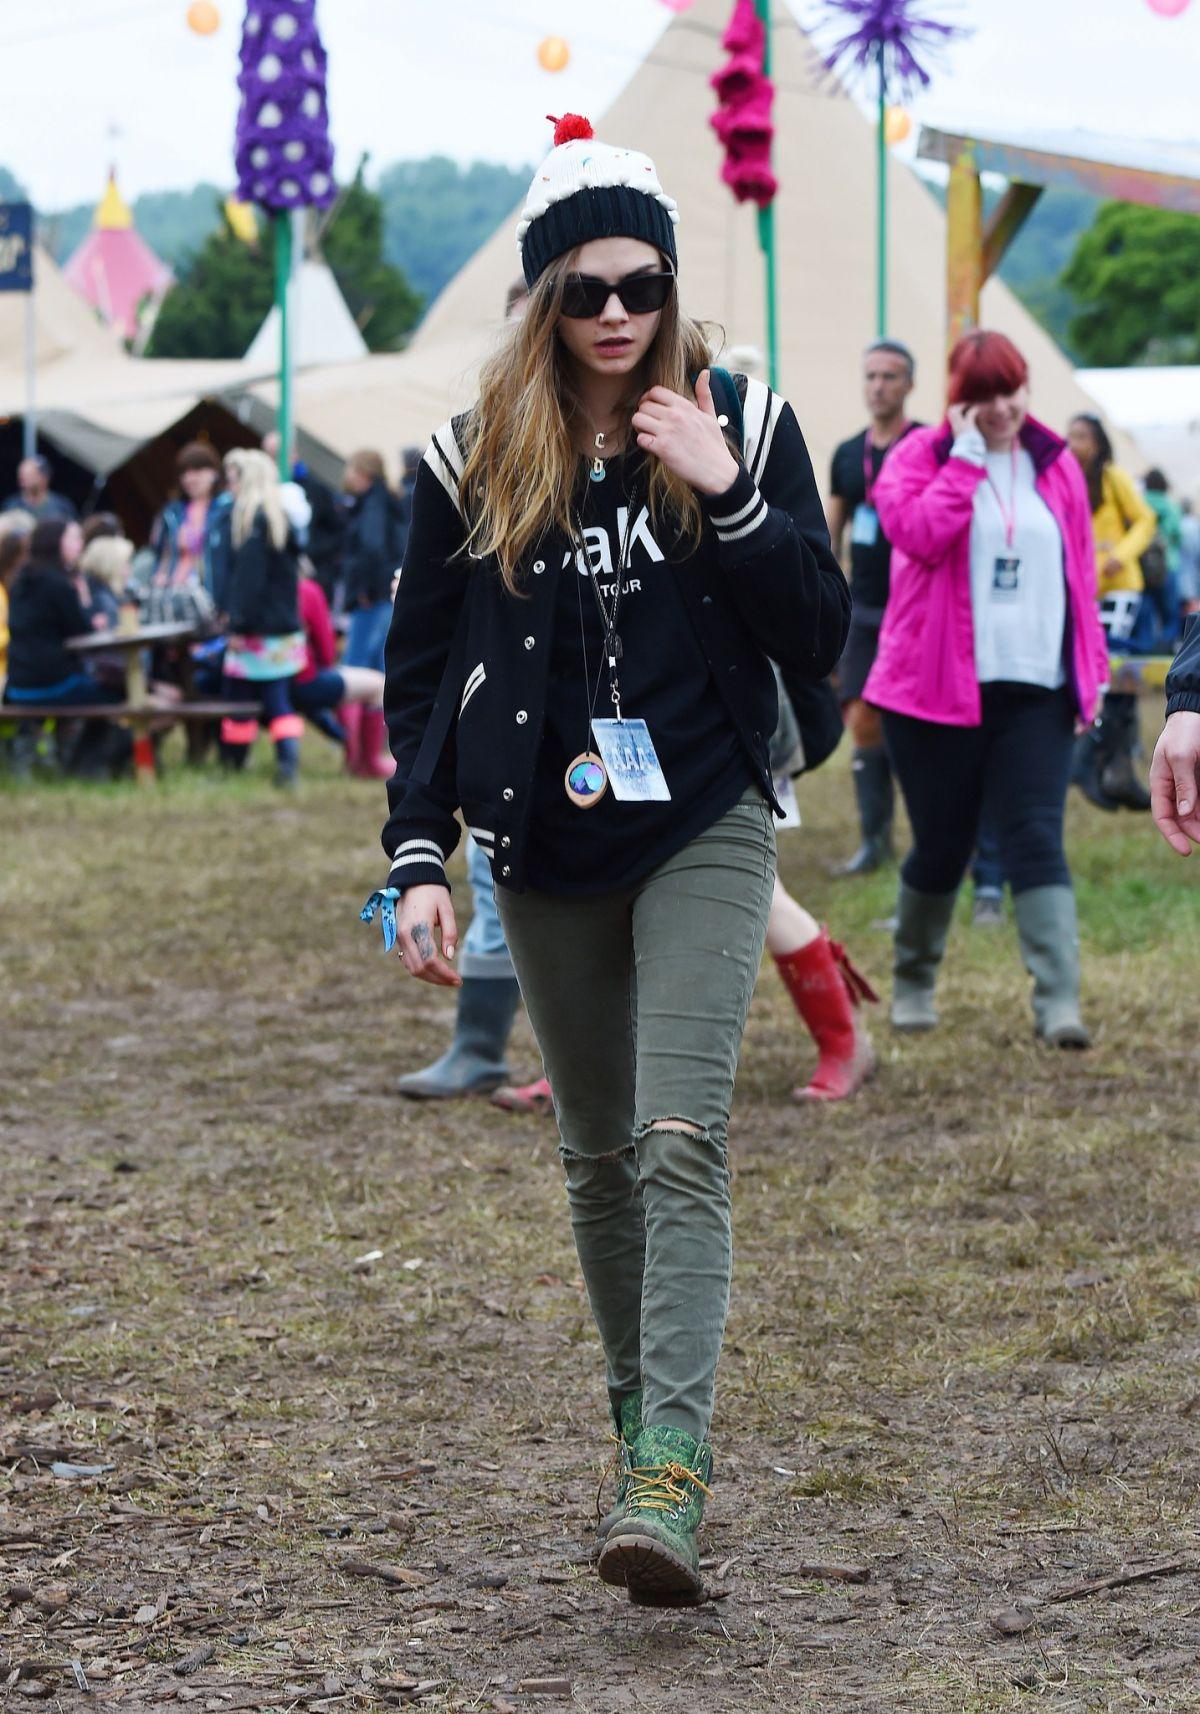 CARA DELEVINGNE at 2015 Glastonbury Festival in Somerset